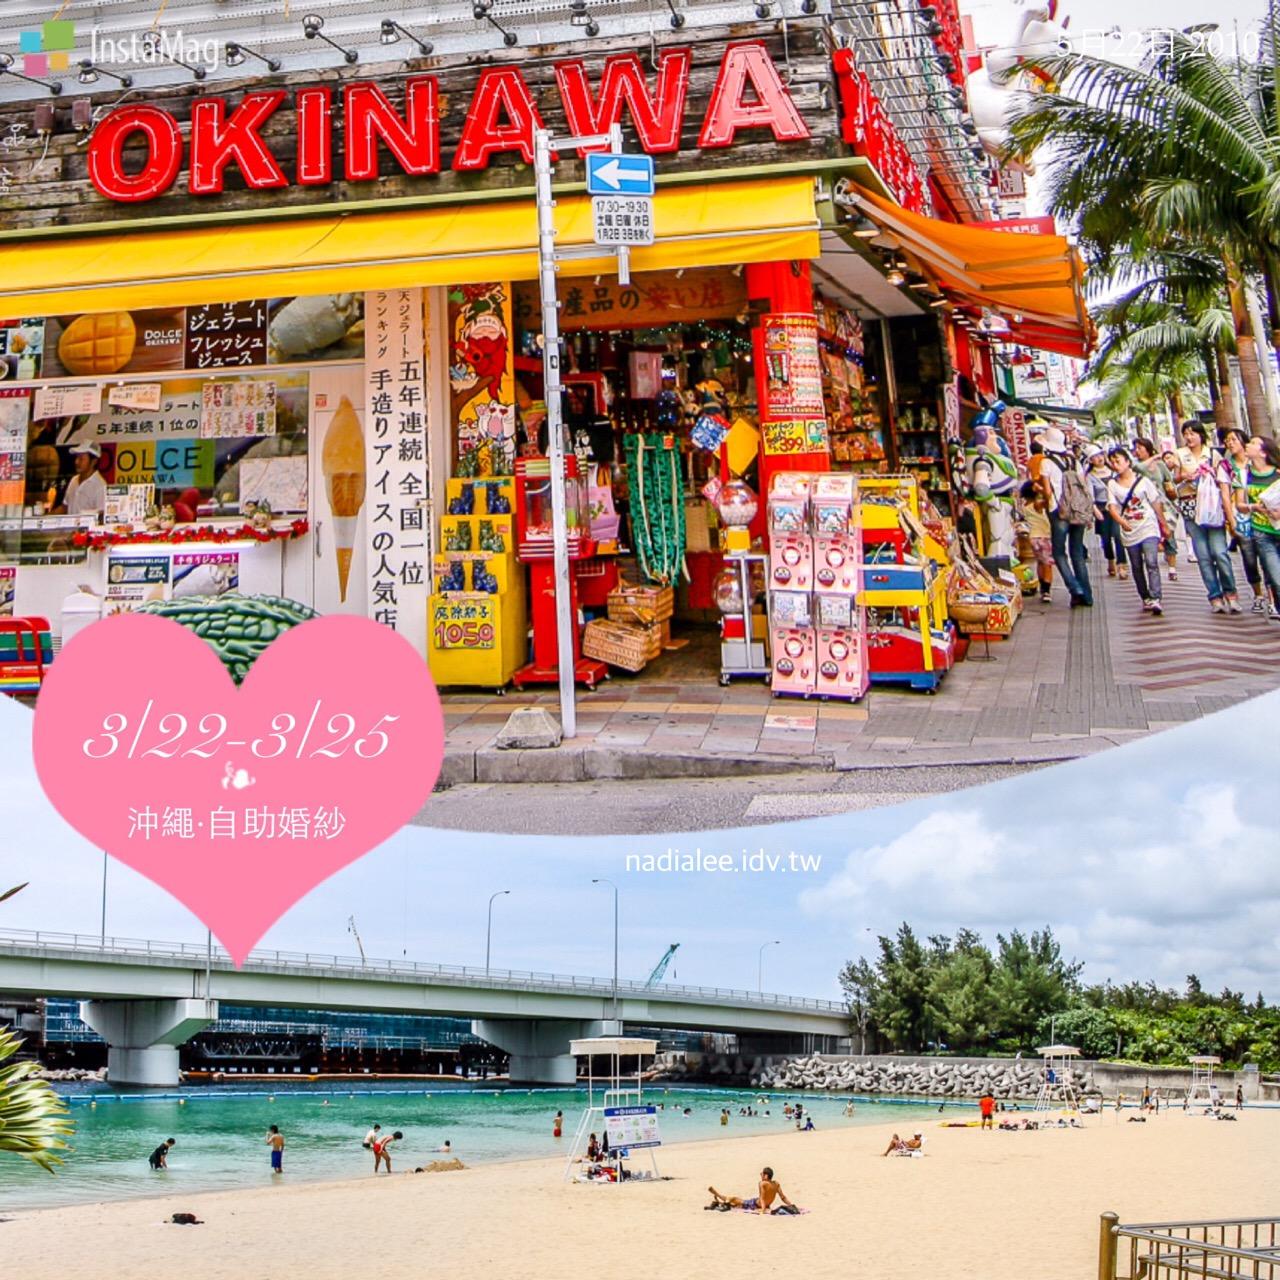 Nadia將於3/22~3/25,2015 在沖繩Okinawa工作 日本海外自助婚紗造型 期間若有需詢問整體造型服務或新娘秘書洽詢檔期的朋友們 請Email:lee_nadialee@yahoo.com.tw 或 留言至FB訊息 我將會儘快與您聯繫!!